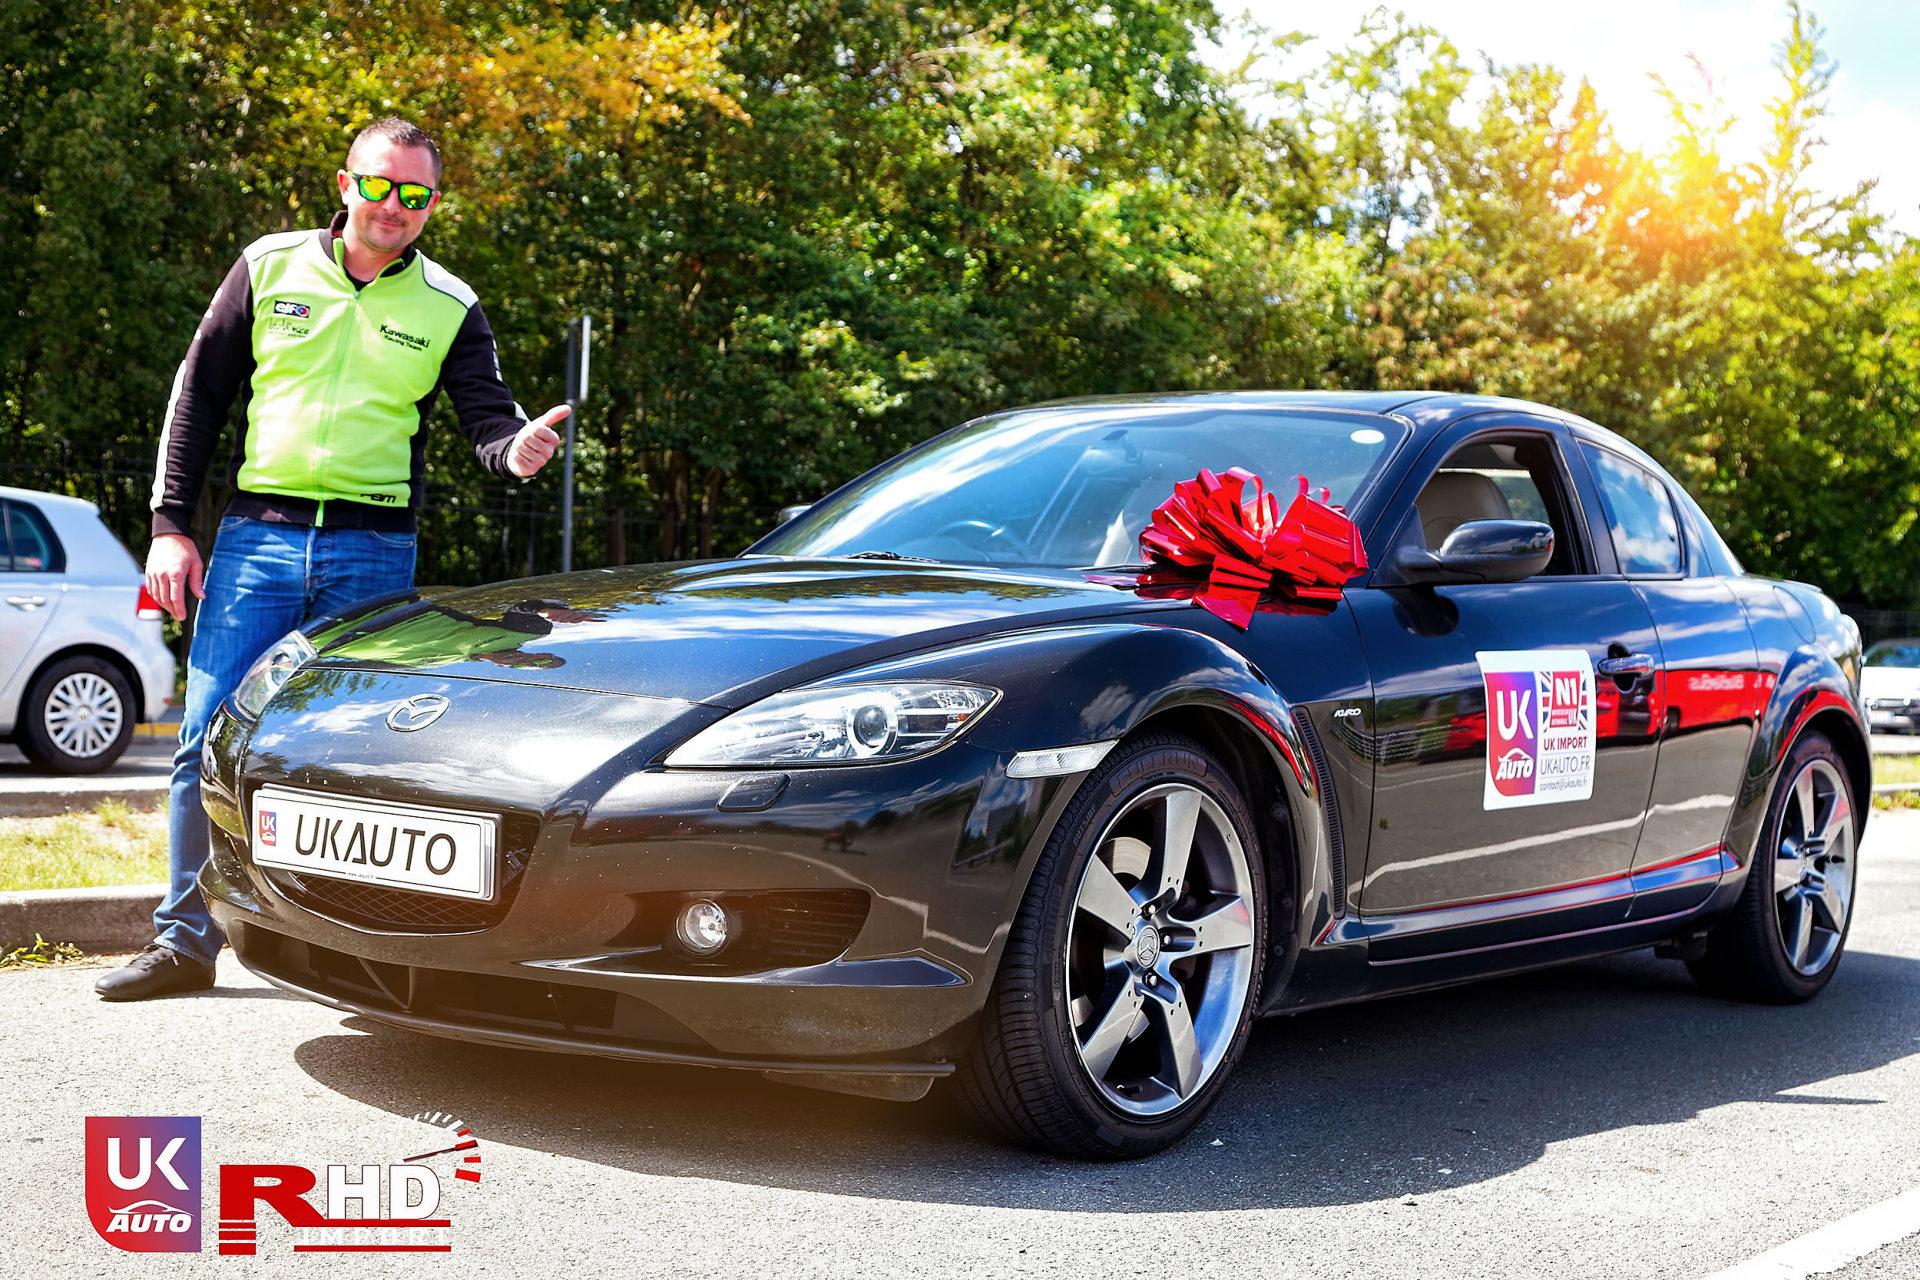 Mazda RX8 Rotary mazda angleterre mazda uk RX8 KURO import uk rhd13 DxO - Import Mazda RX8 KURO ROTARY depuis Autotrader par UKAUTO site annonces UK rhd Felicitation a Dimitri